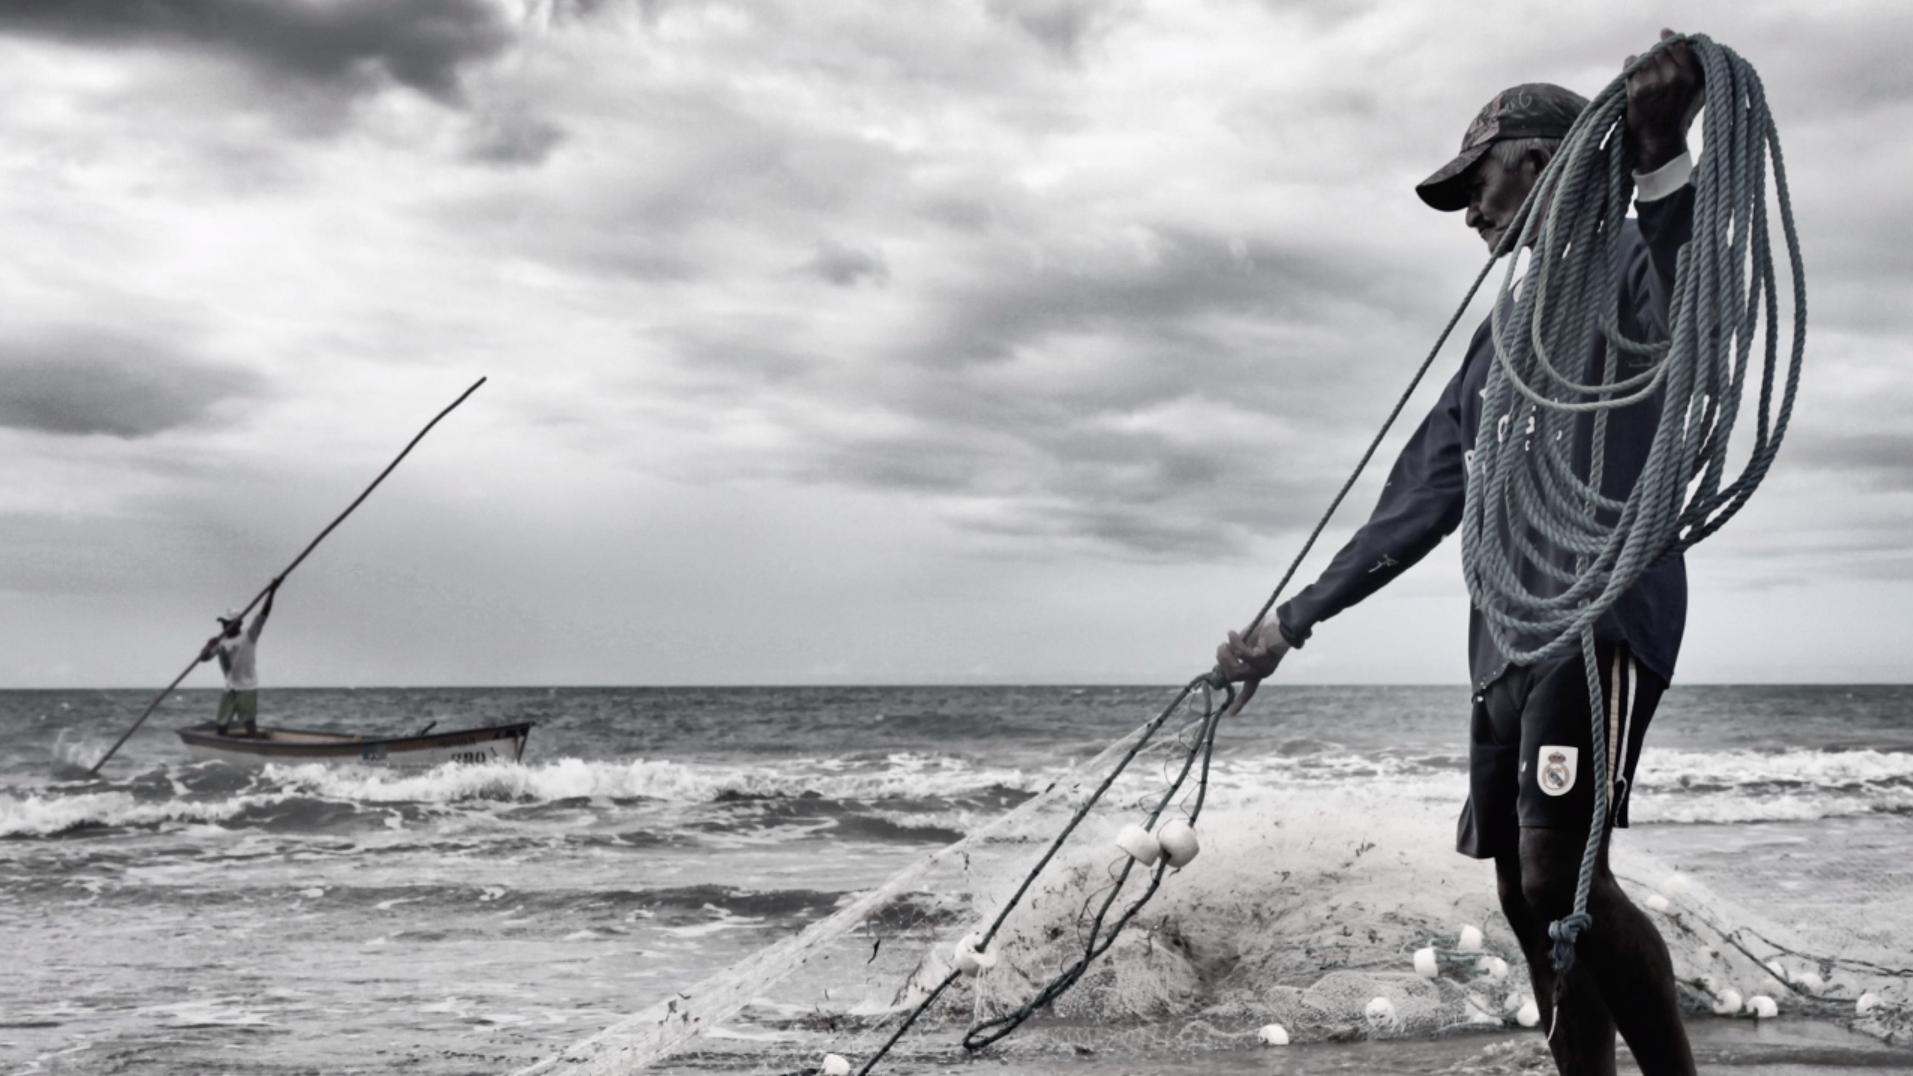 Pescador.png